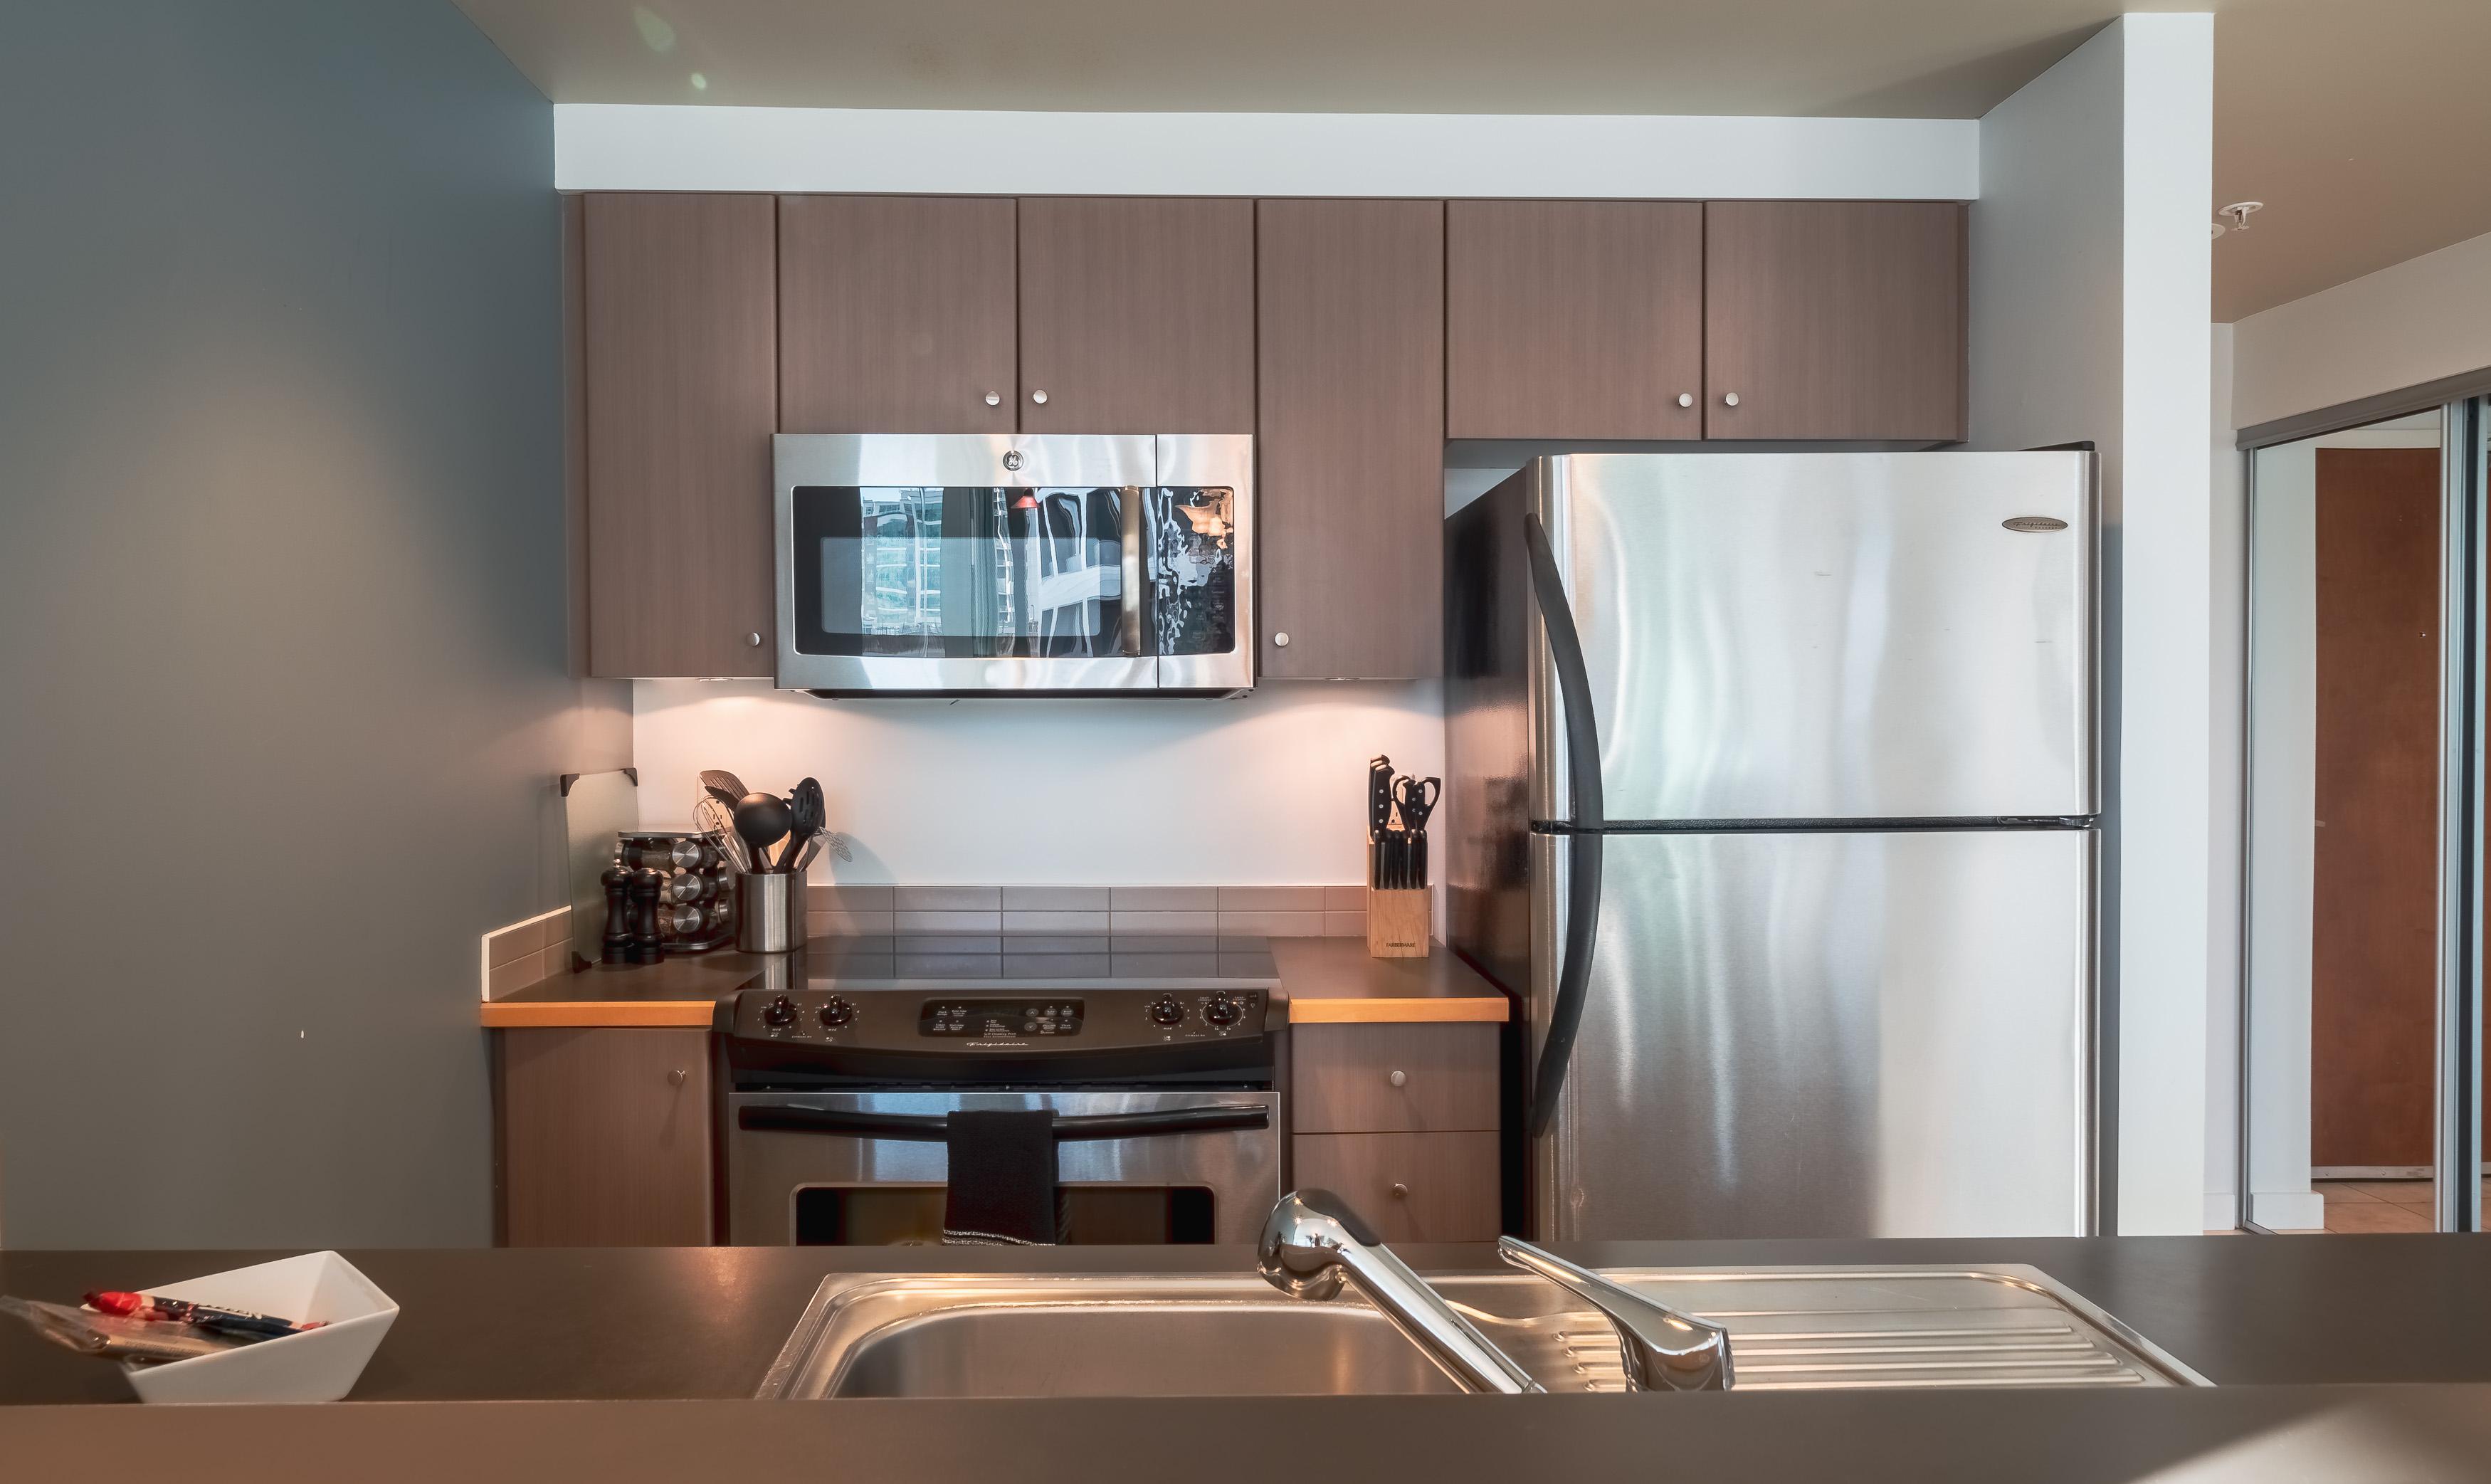 Corazon 507 Kitchen